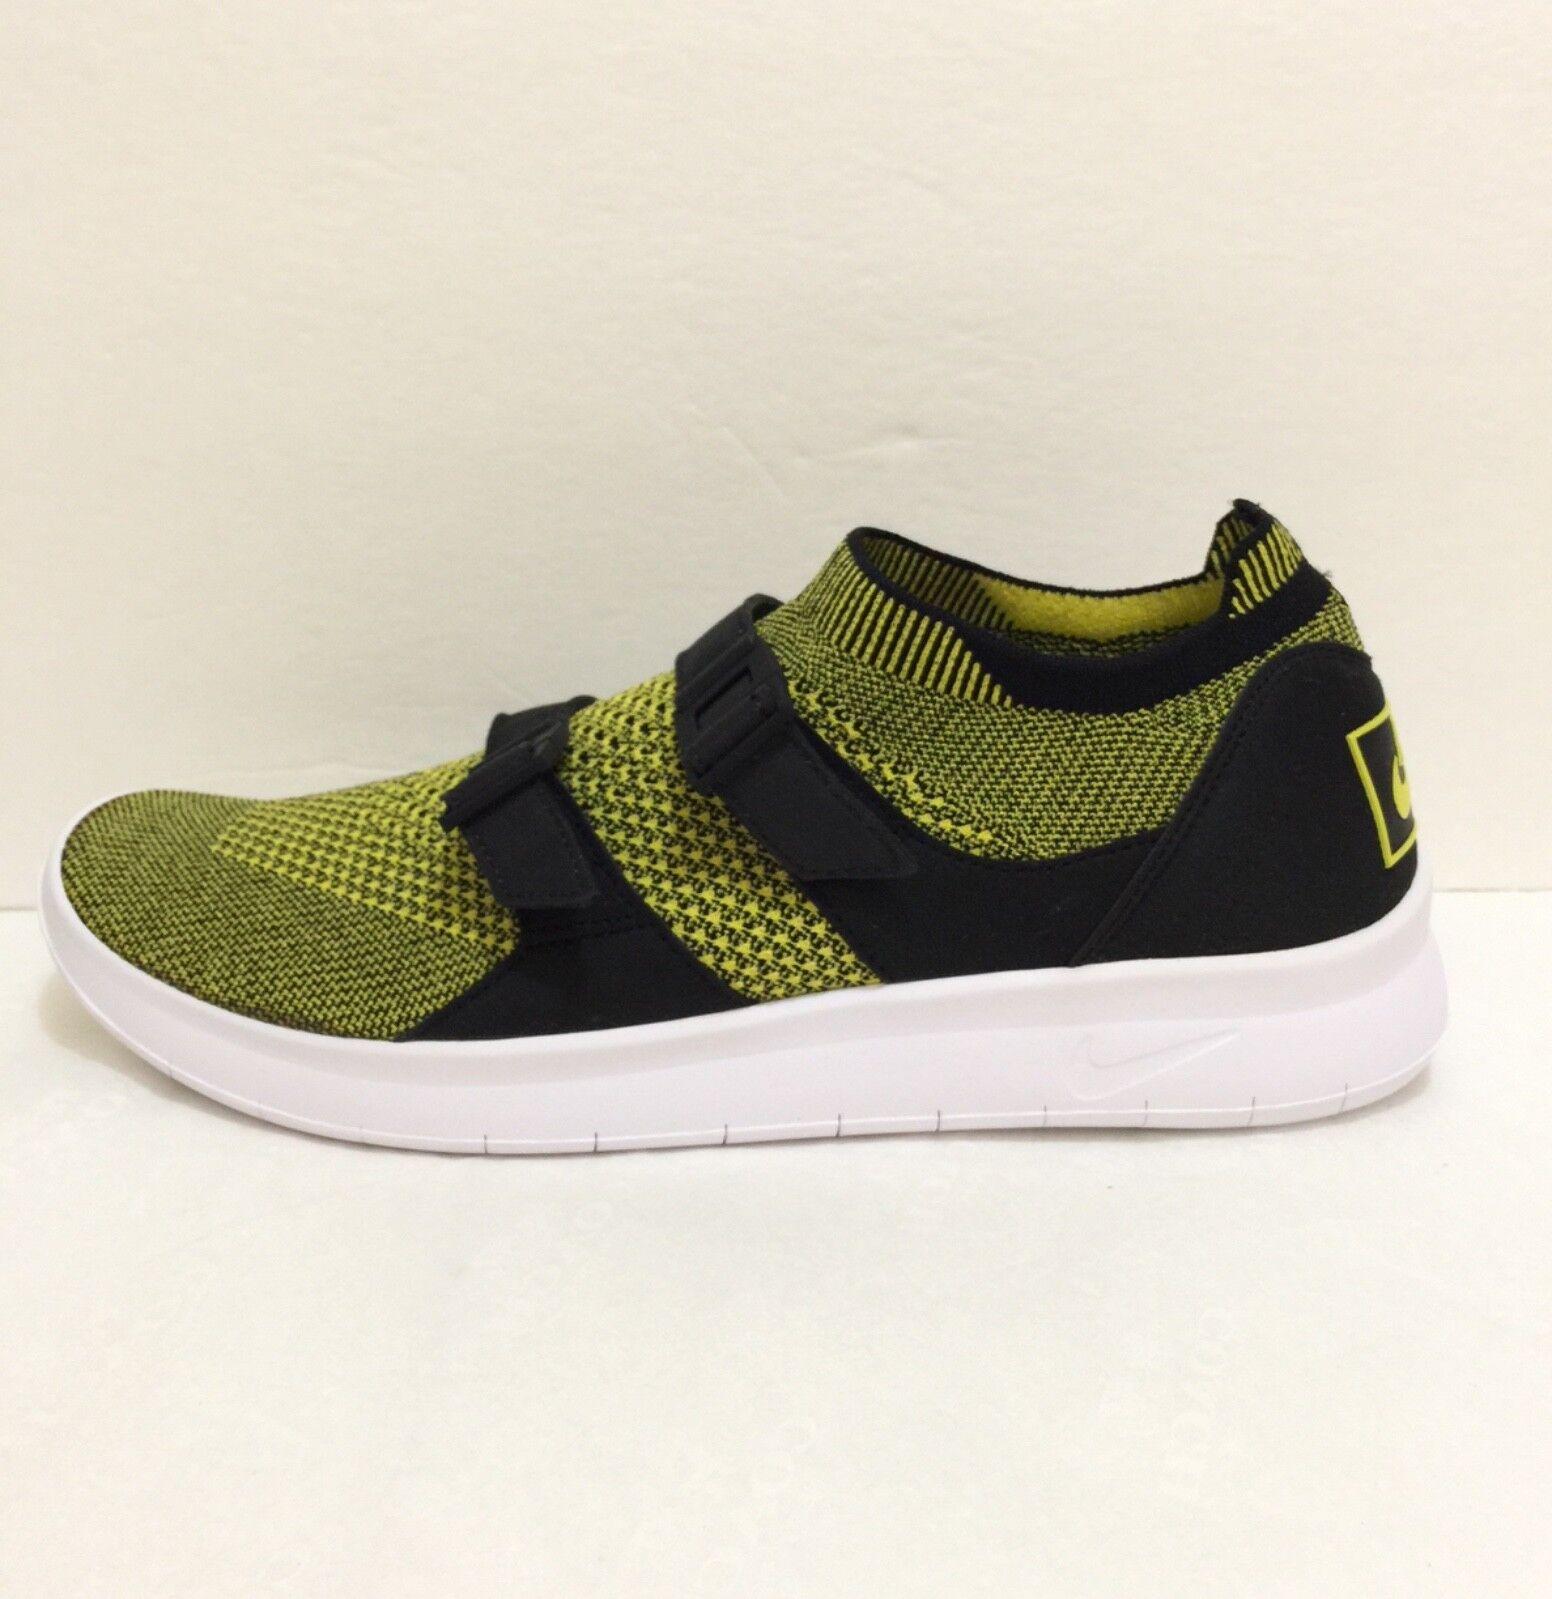 New Men's Nike Air Sockracer Flyknit Running Shoes Multi-Comfortable